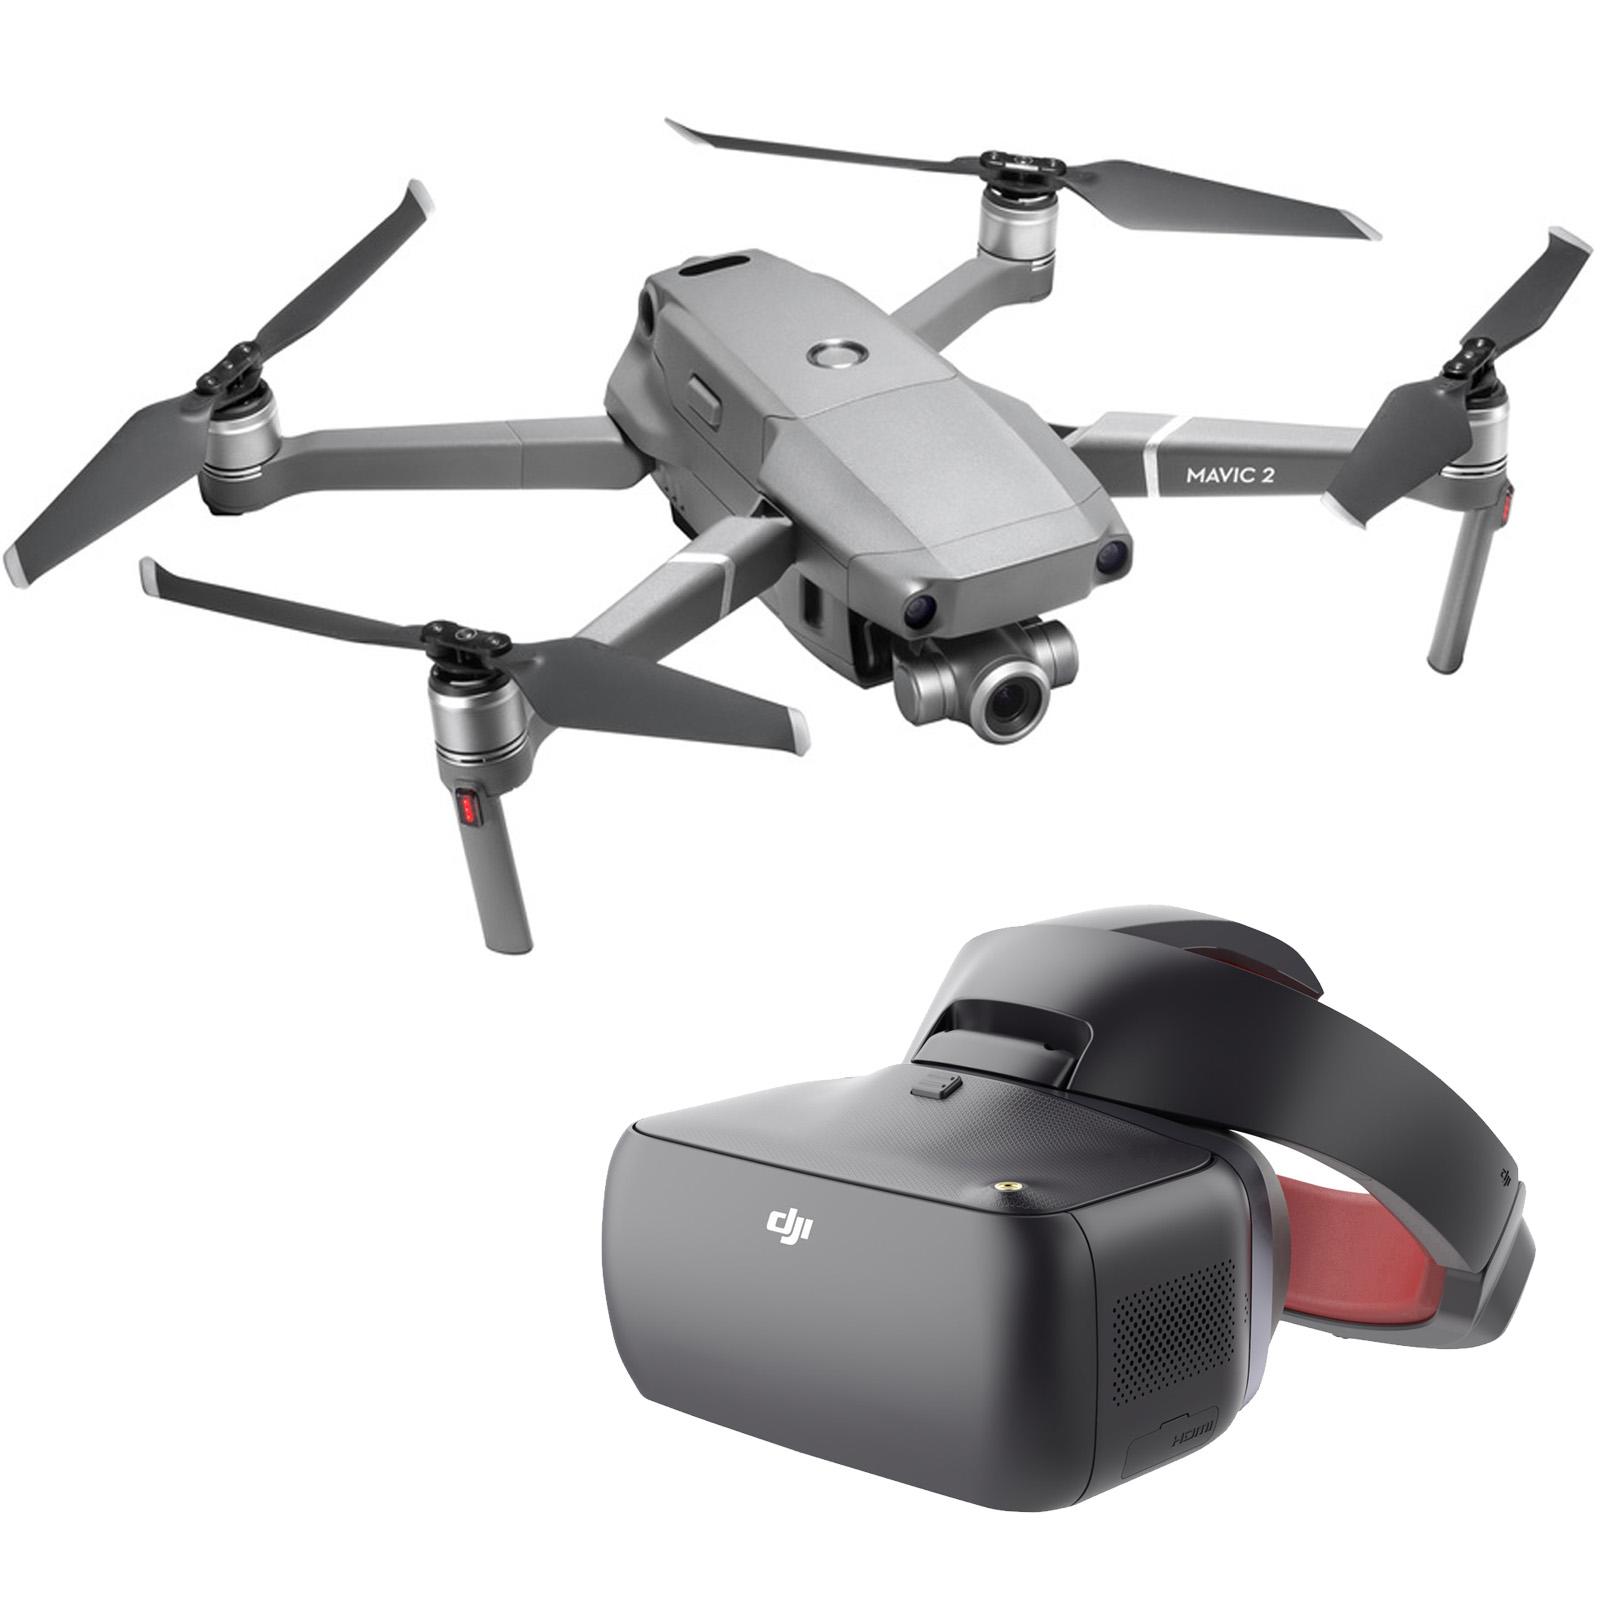 DJI cameradrone DJI Mavic 2 Zoom DJI Goggles Racing Edition